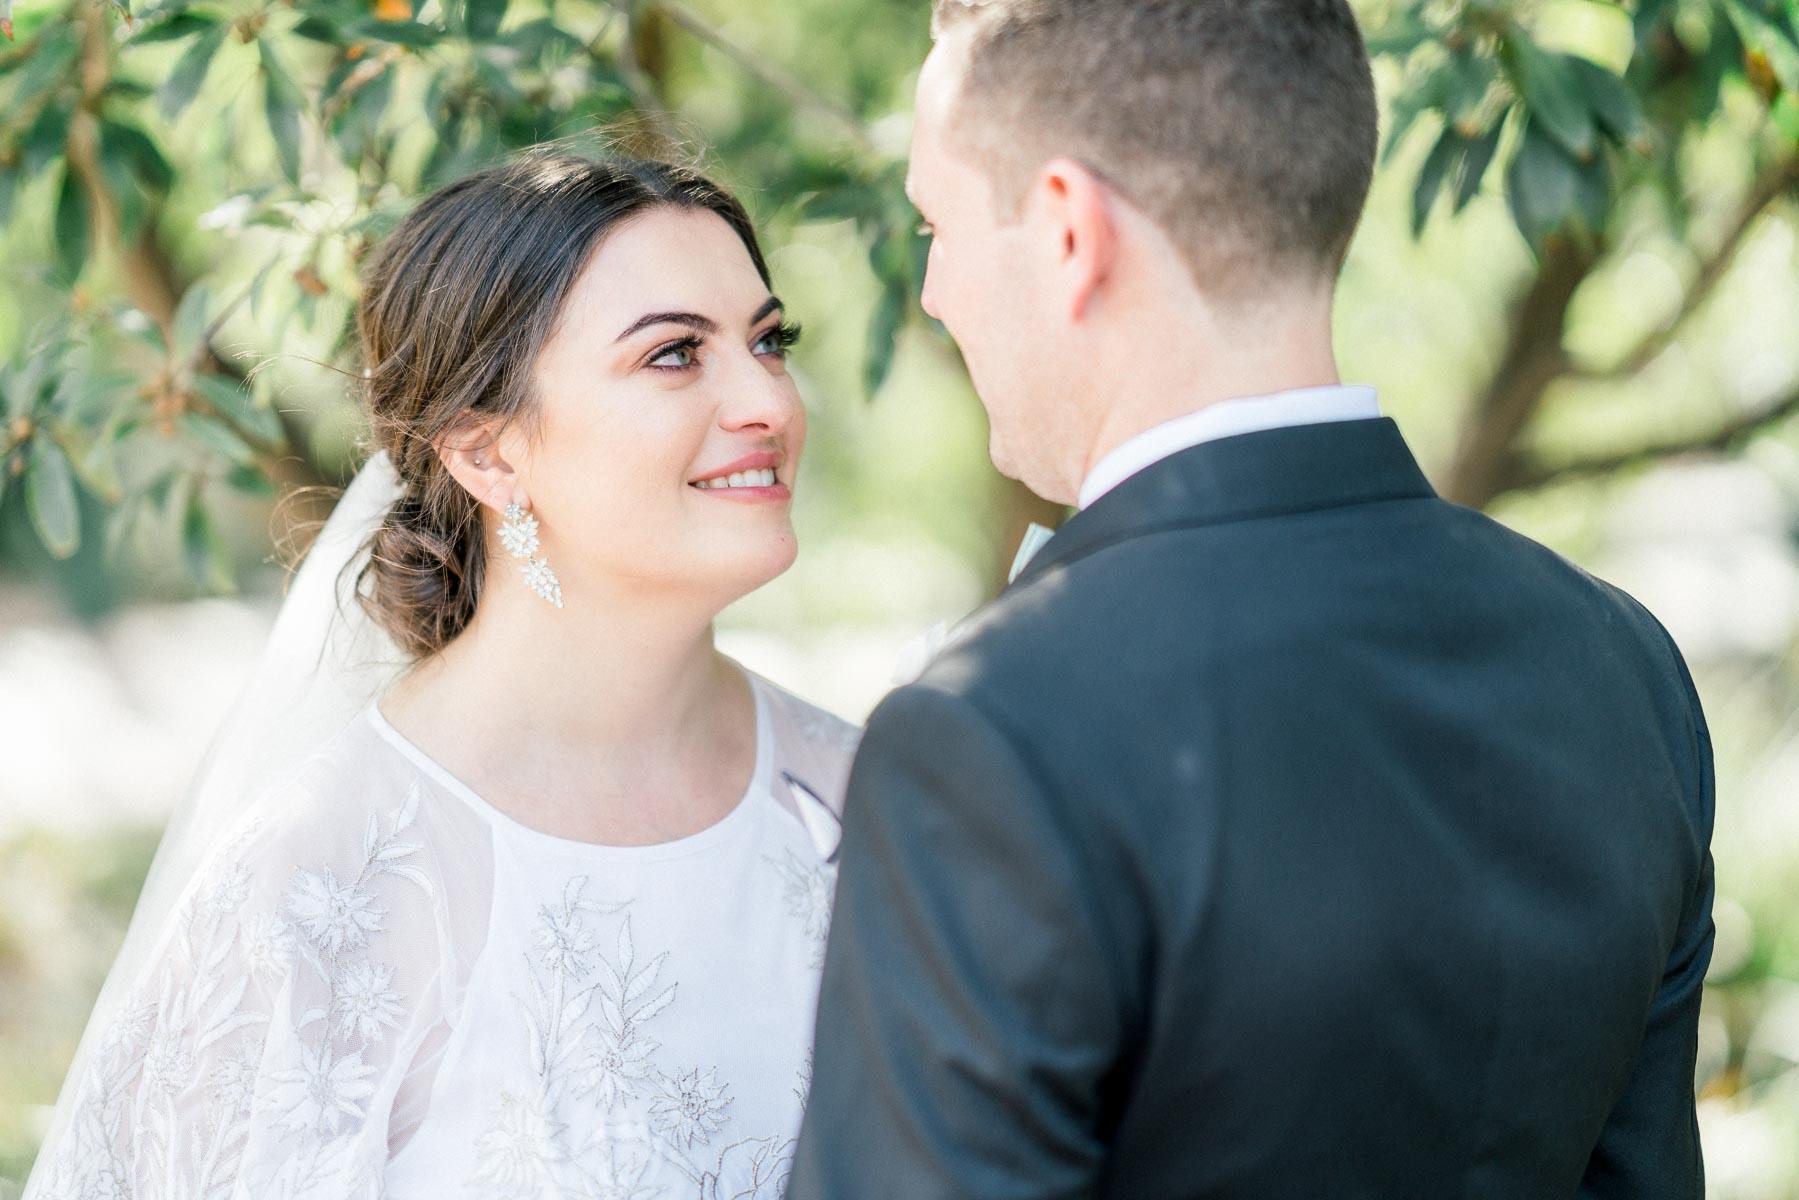 little-henri-cafe-wedding-thornbury-heart+soul-weddings-jane-aaron-05452.jpg